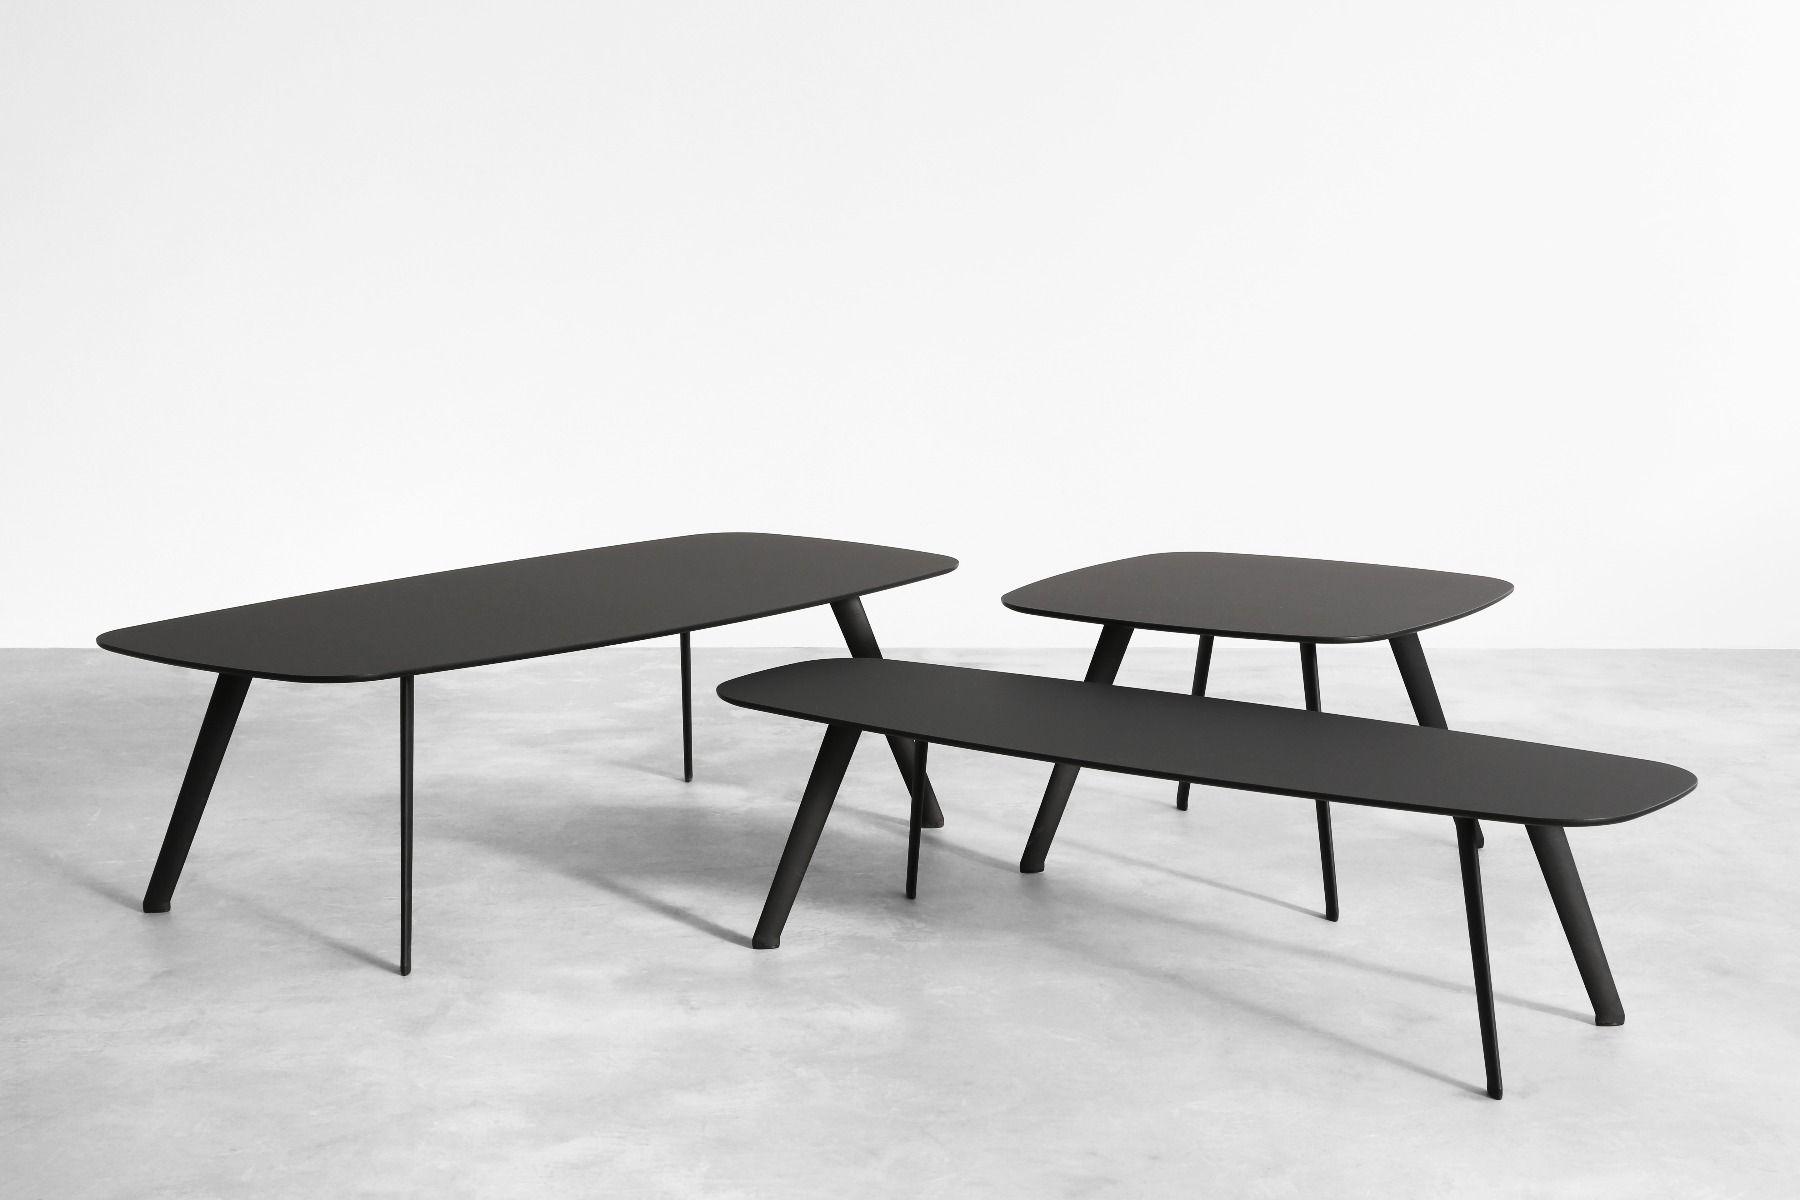 Stua Solapa Tables-Fenix showing three sizes